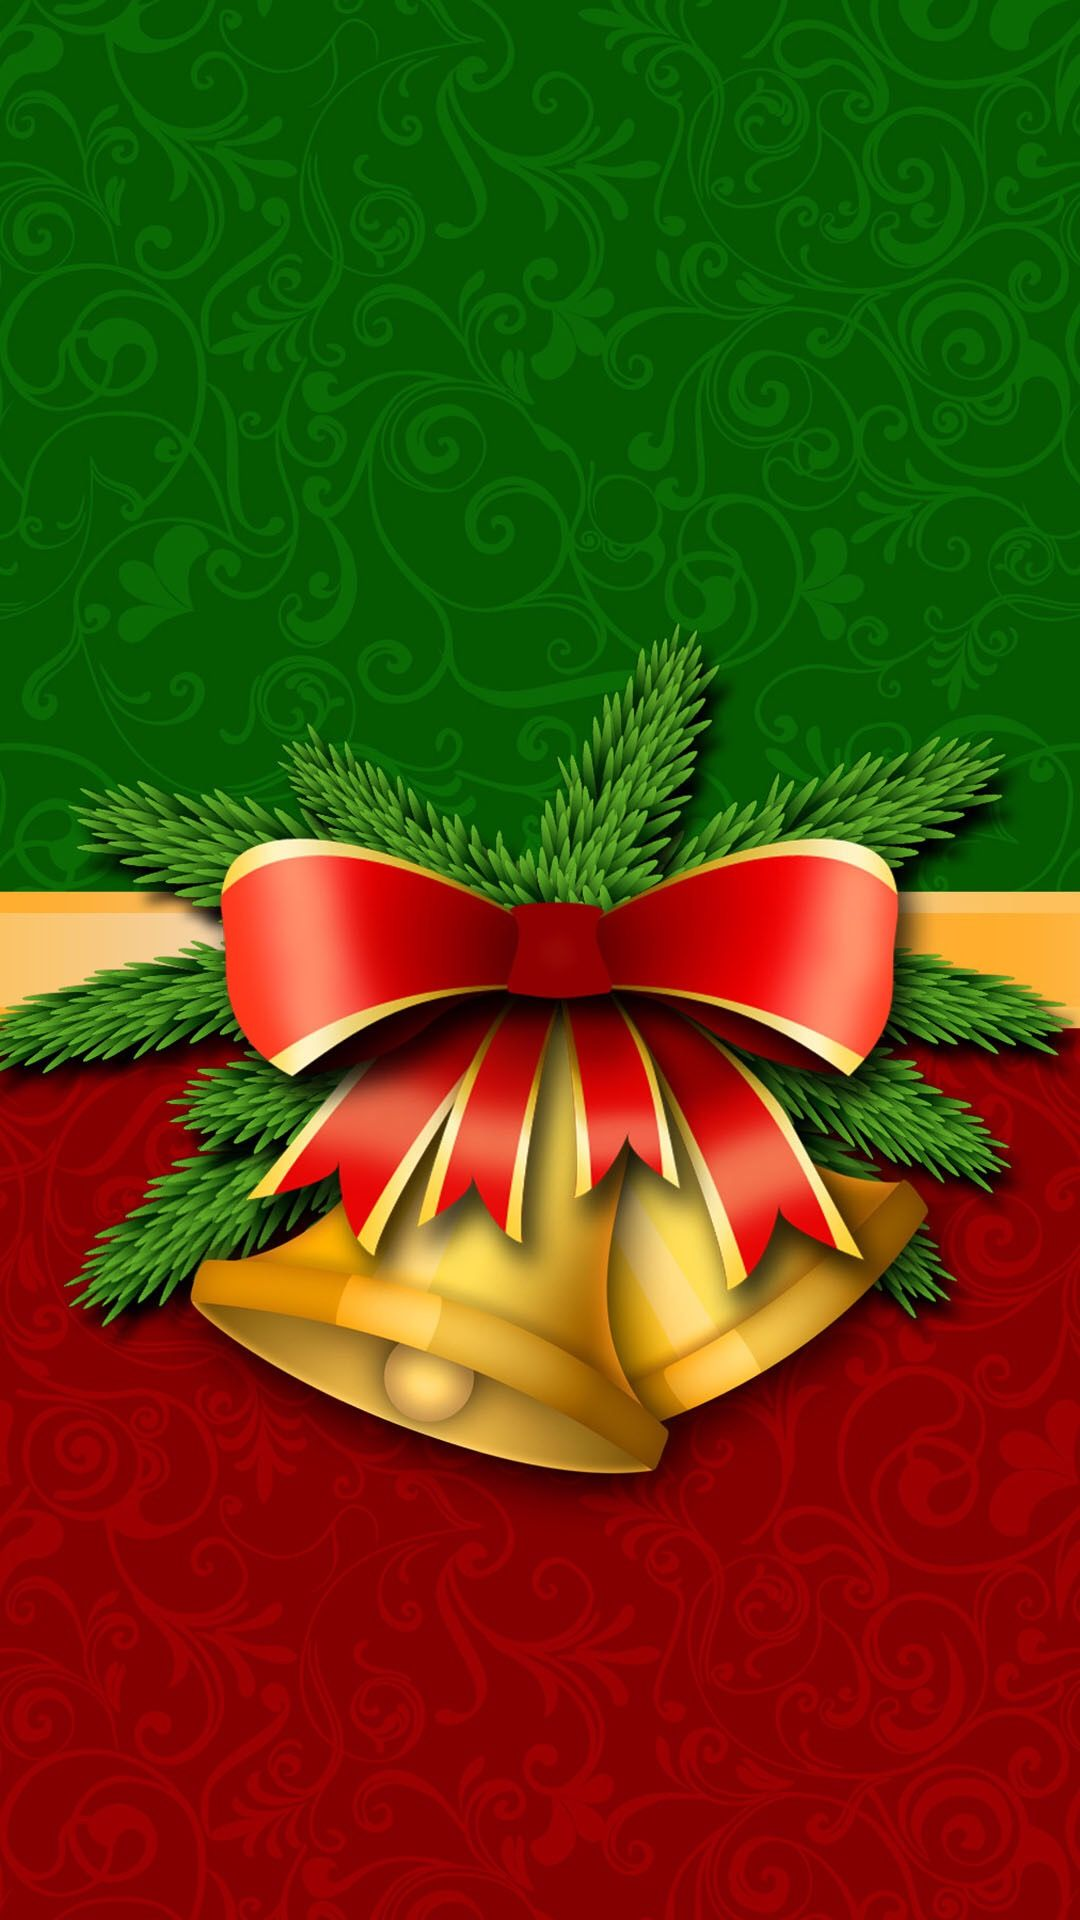 Pin by Melani Mel on New year Christmas holidays